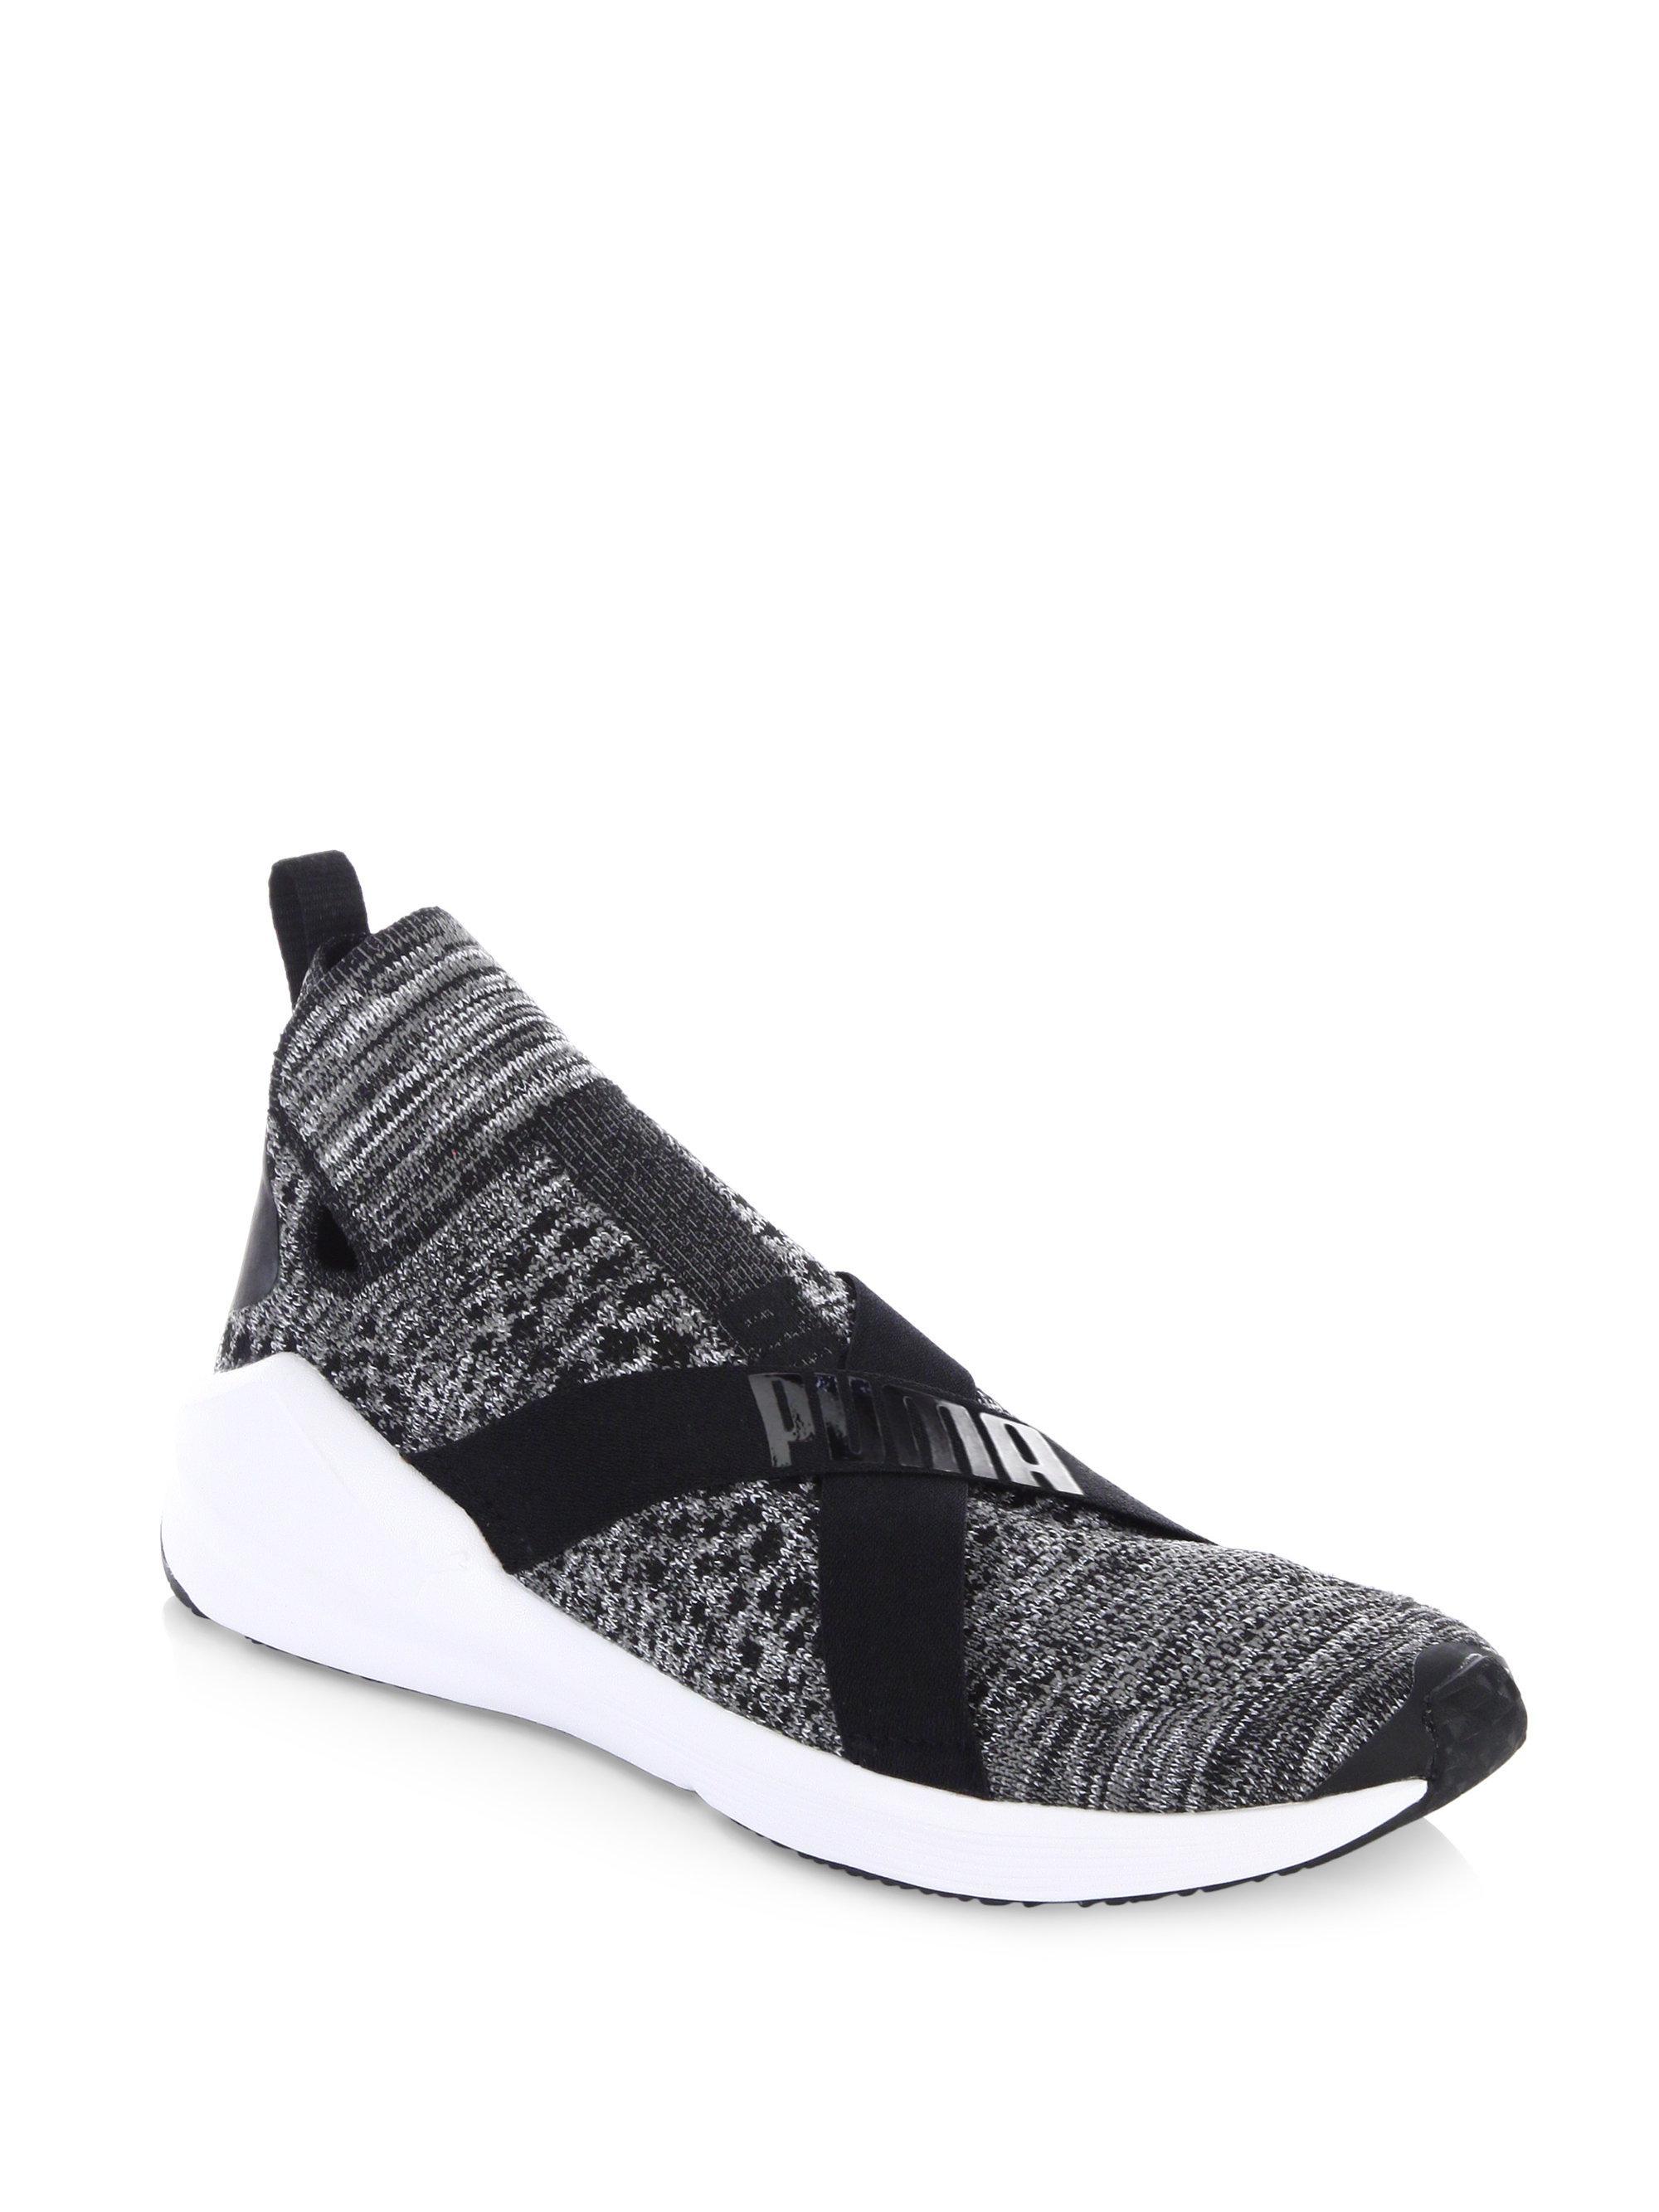 ... Women  Lyst - Puma Fierce Evoknit Training Shoes in Black ... 8bc03dbaa